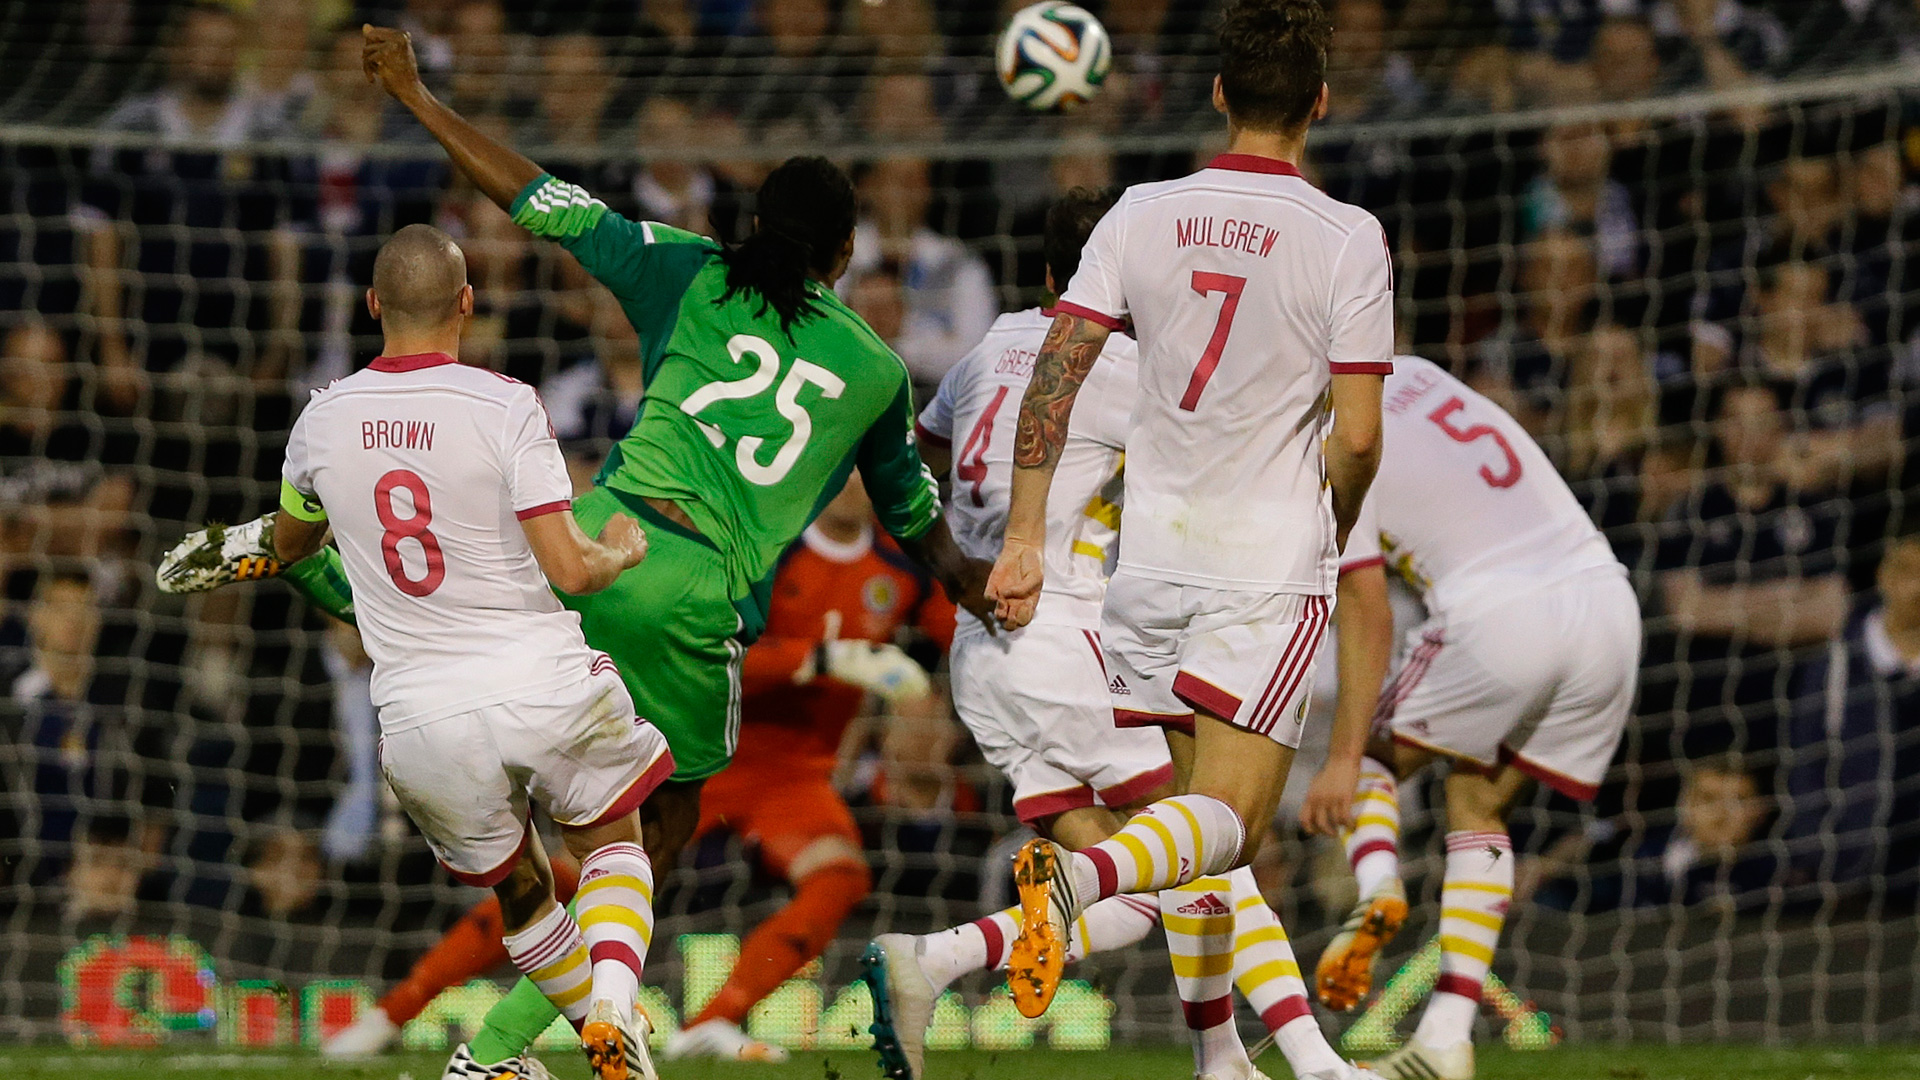 Nigeria-scotland-soccer-friendly-052814-ap-ftr